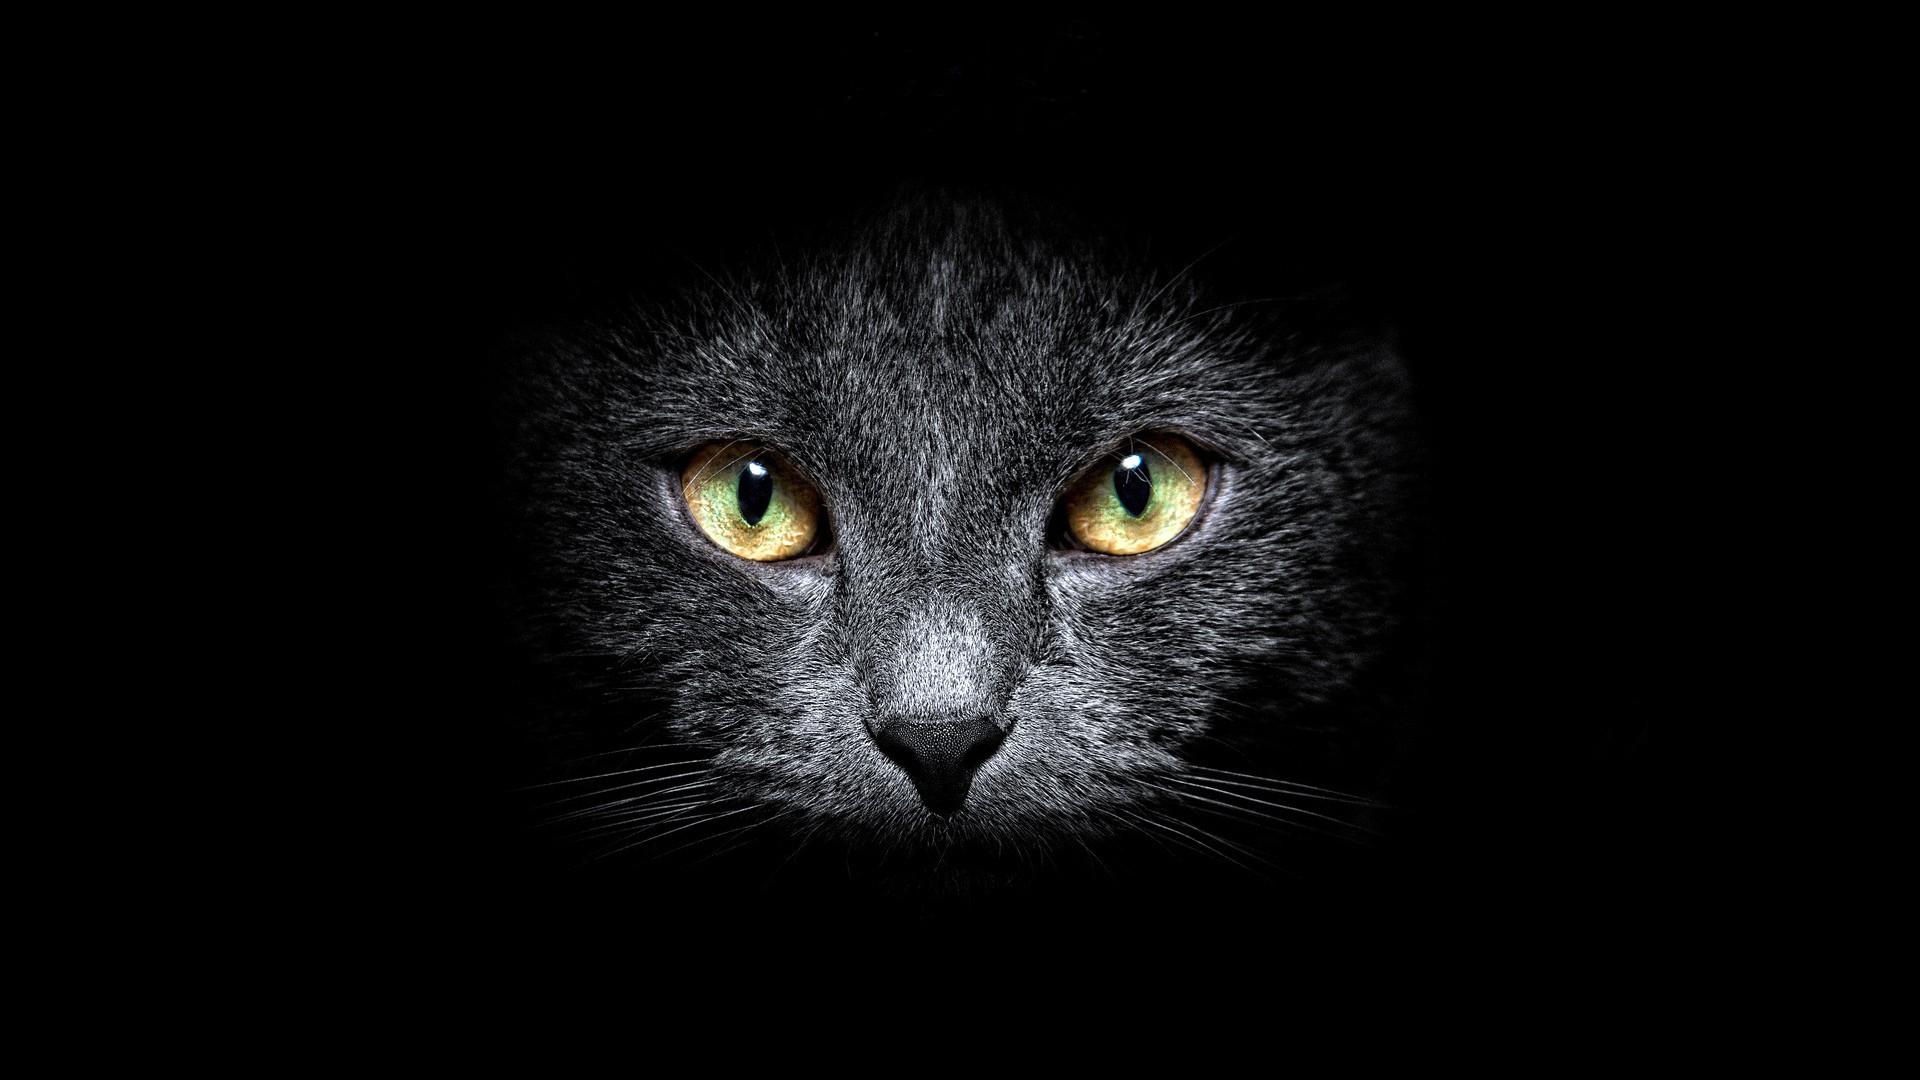 Animal Cat 1920x1080